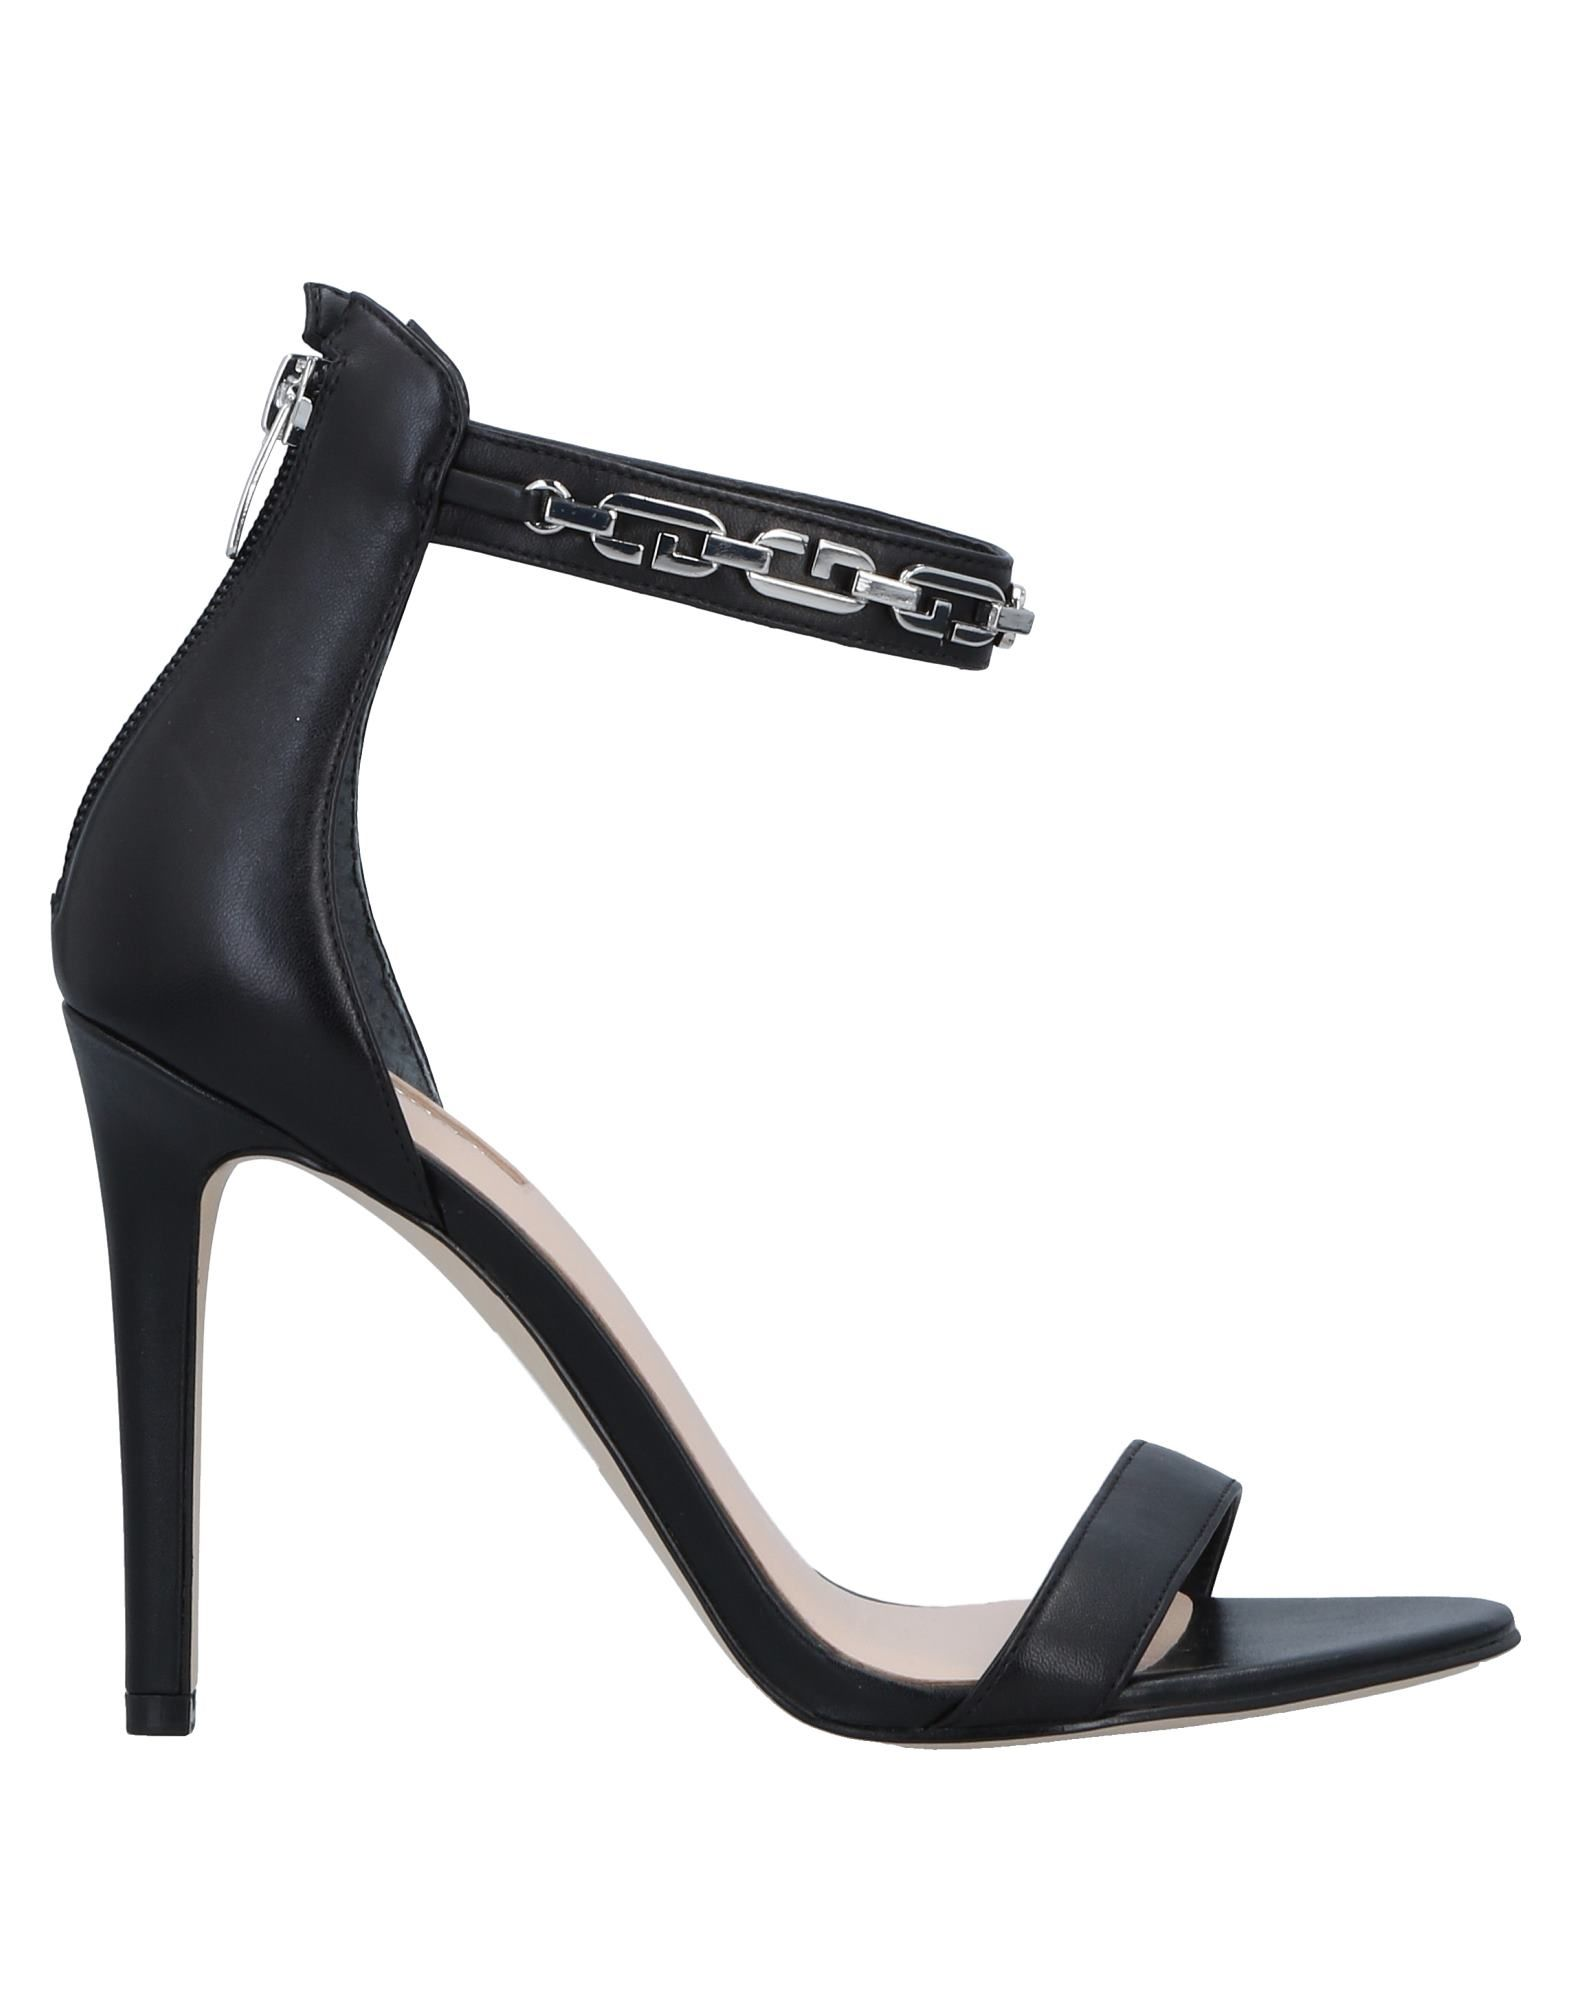 Guess Sandals - Australia Women Guess Sandals online on  Australia - - 11521042RD 296f56